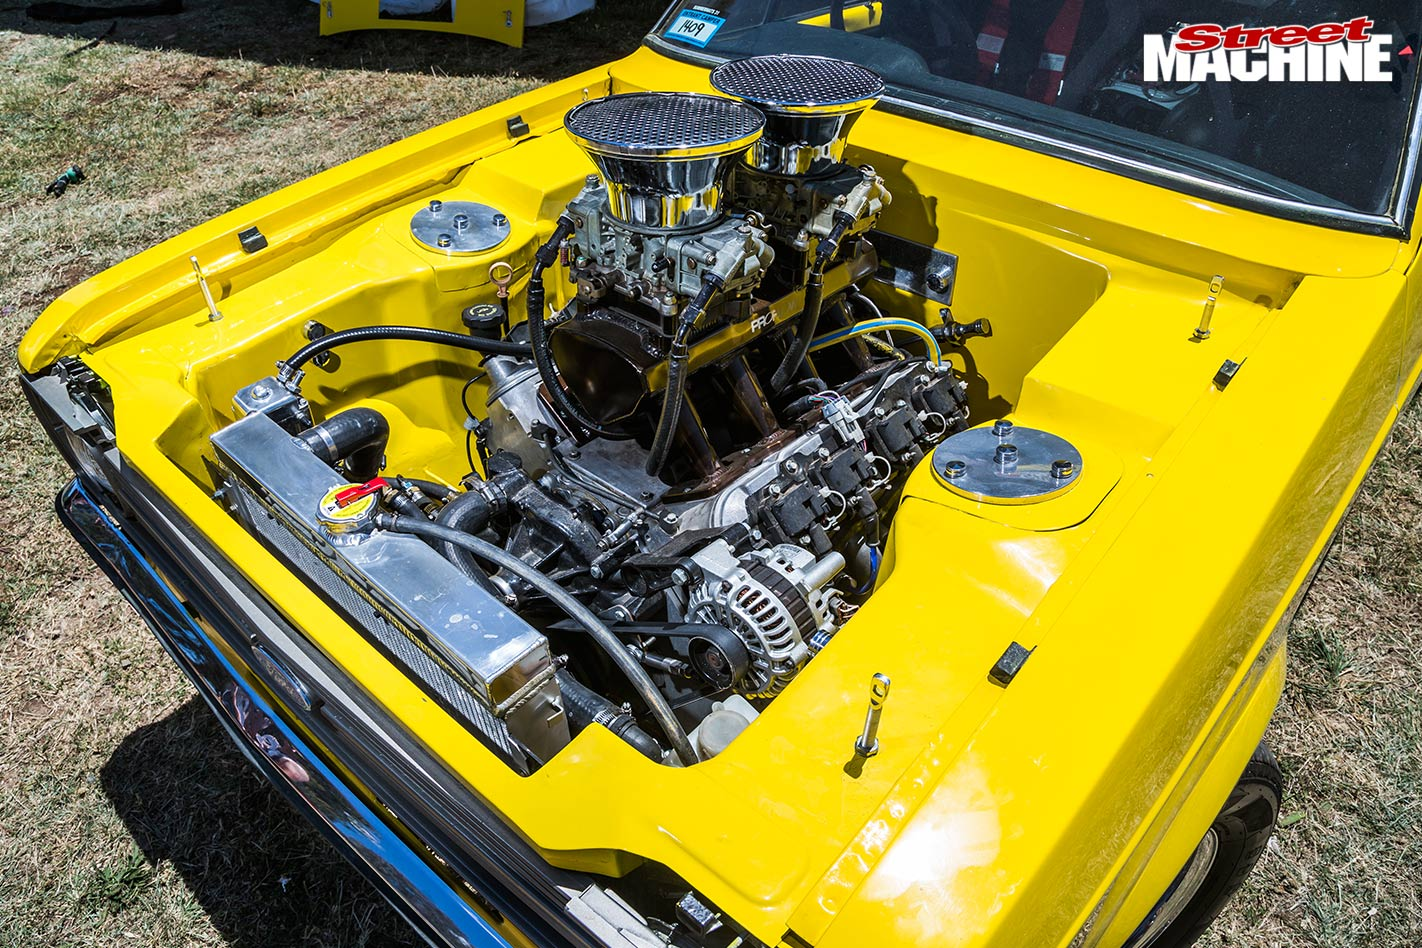 Ford Escort engine bay